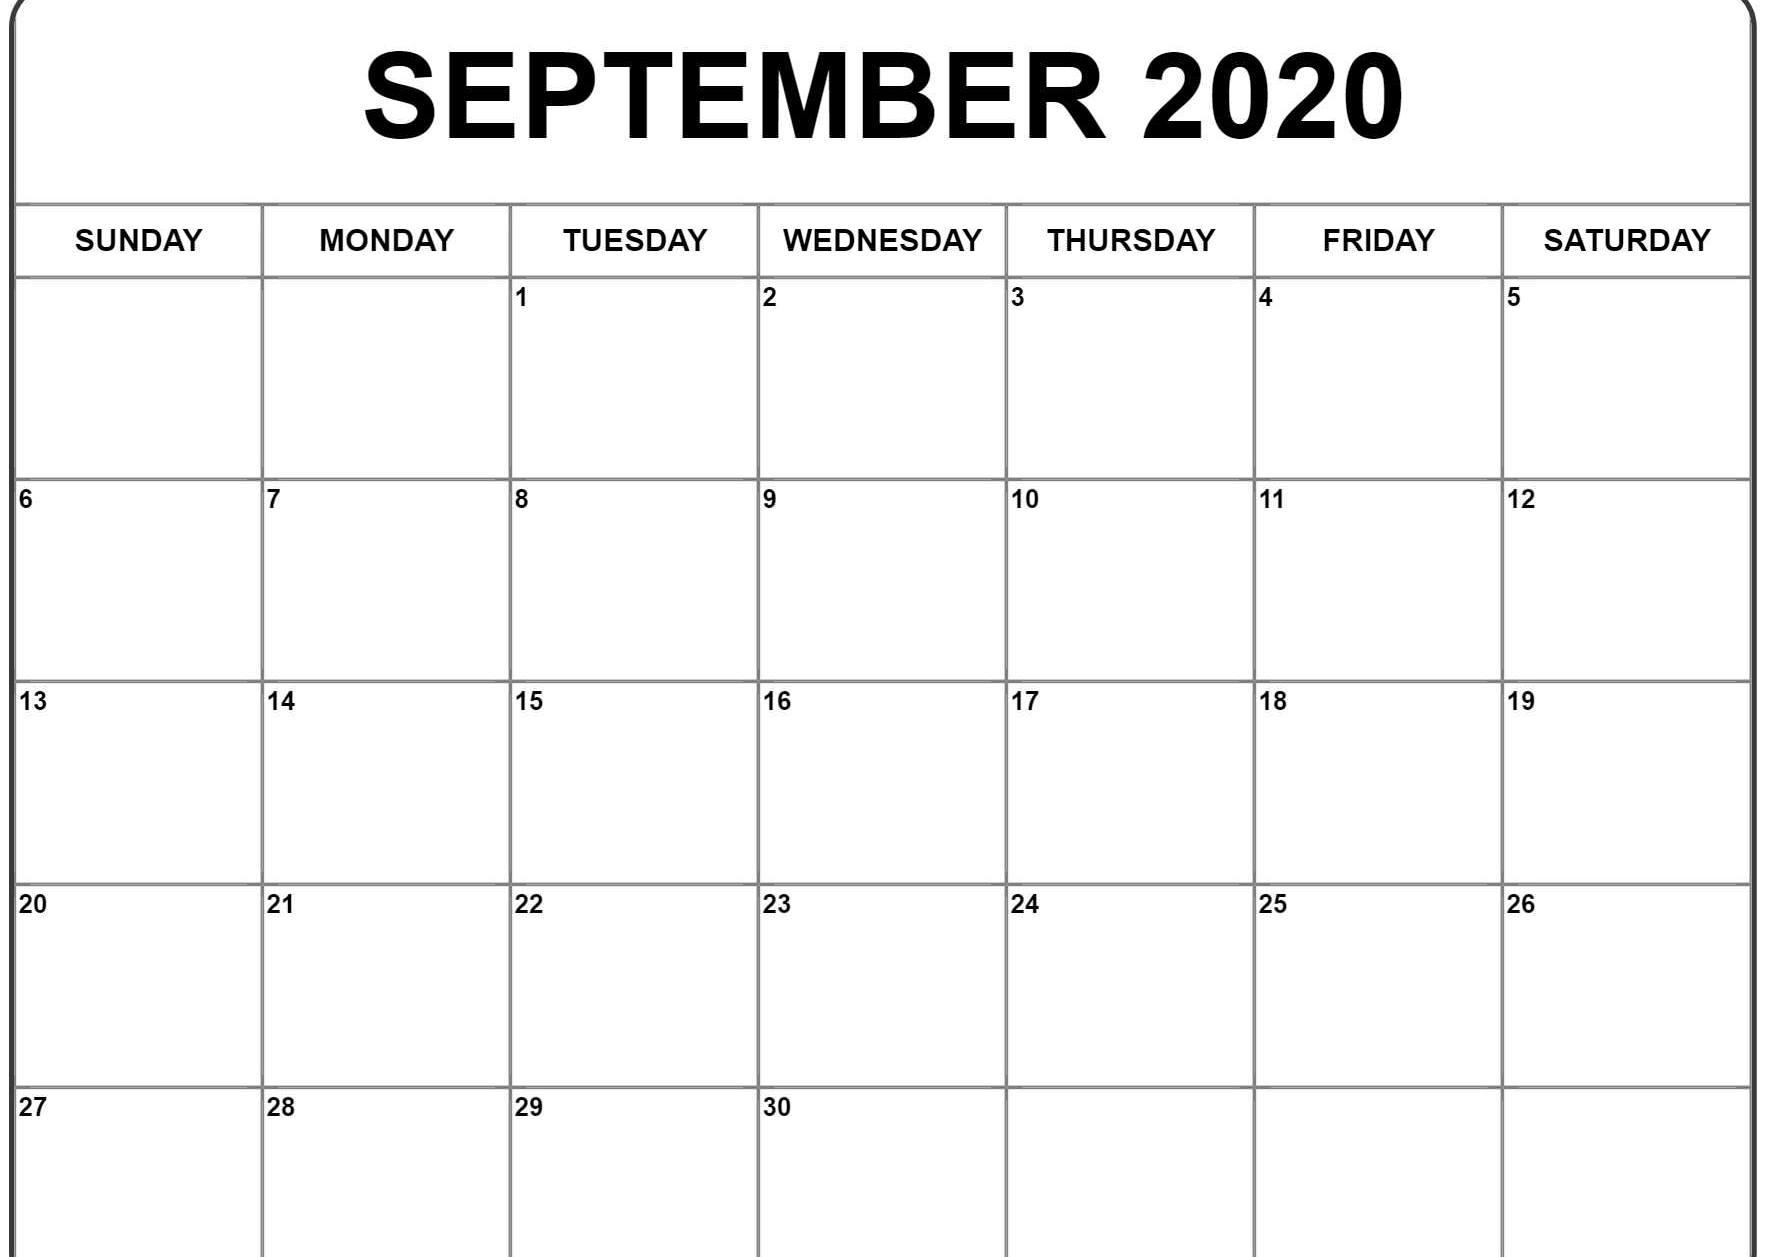 Awesome September 2020 Calendar Pdf, Word, Excel Template in Calendar Excel Template 2020